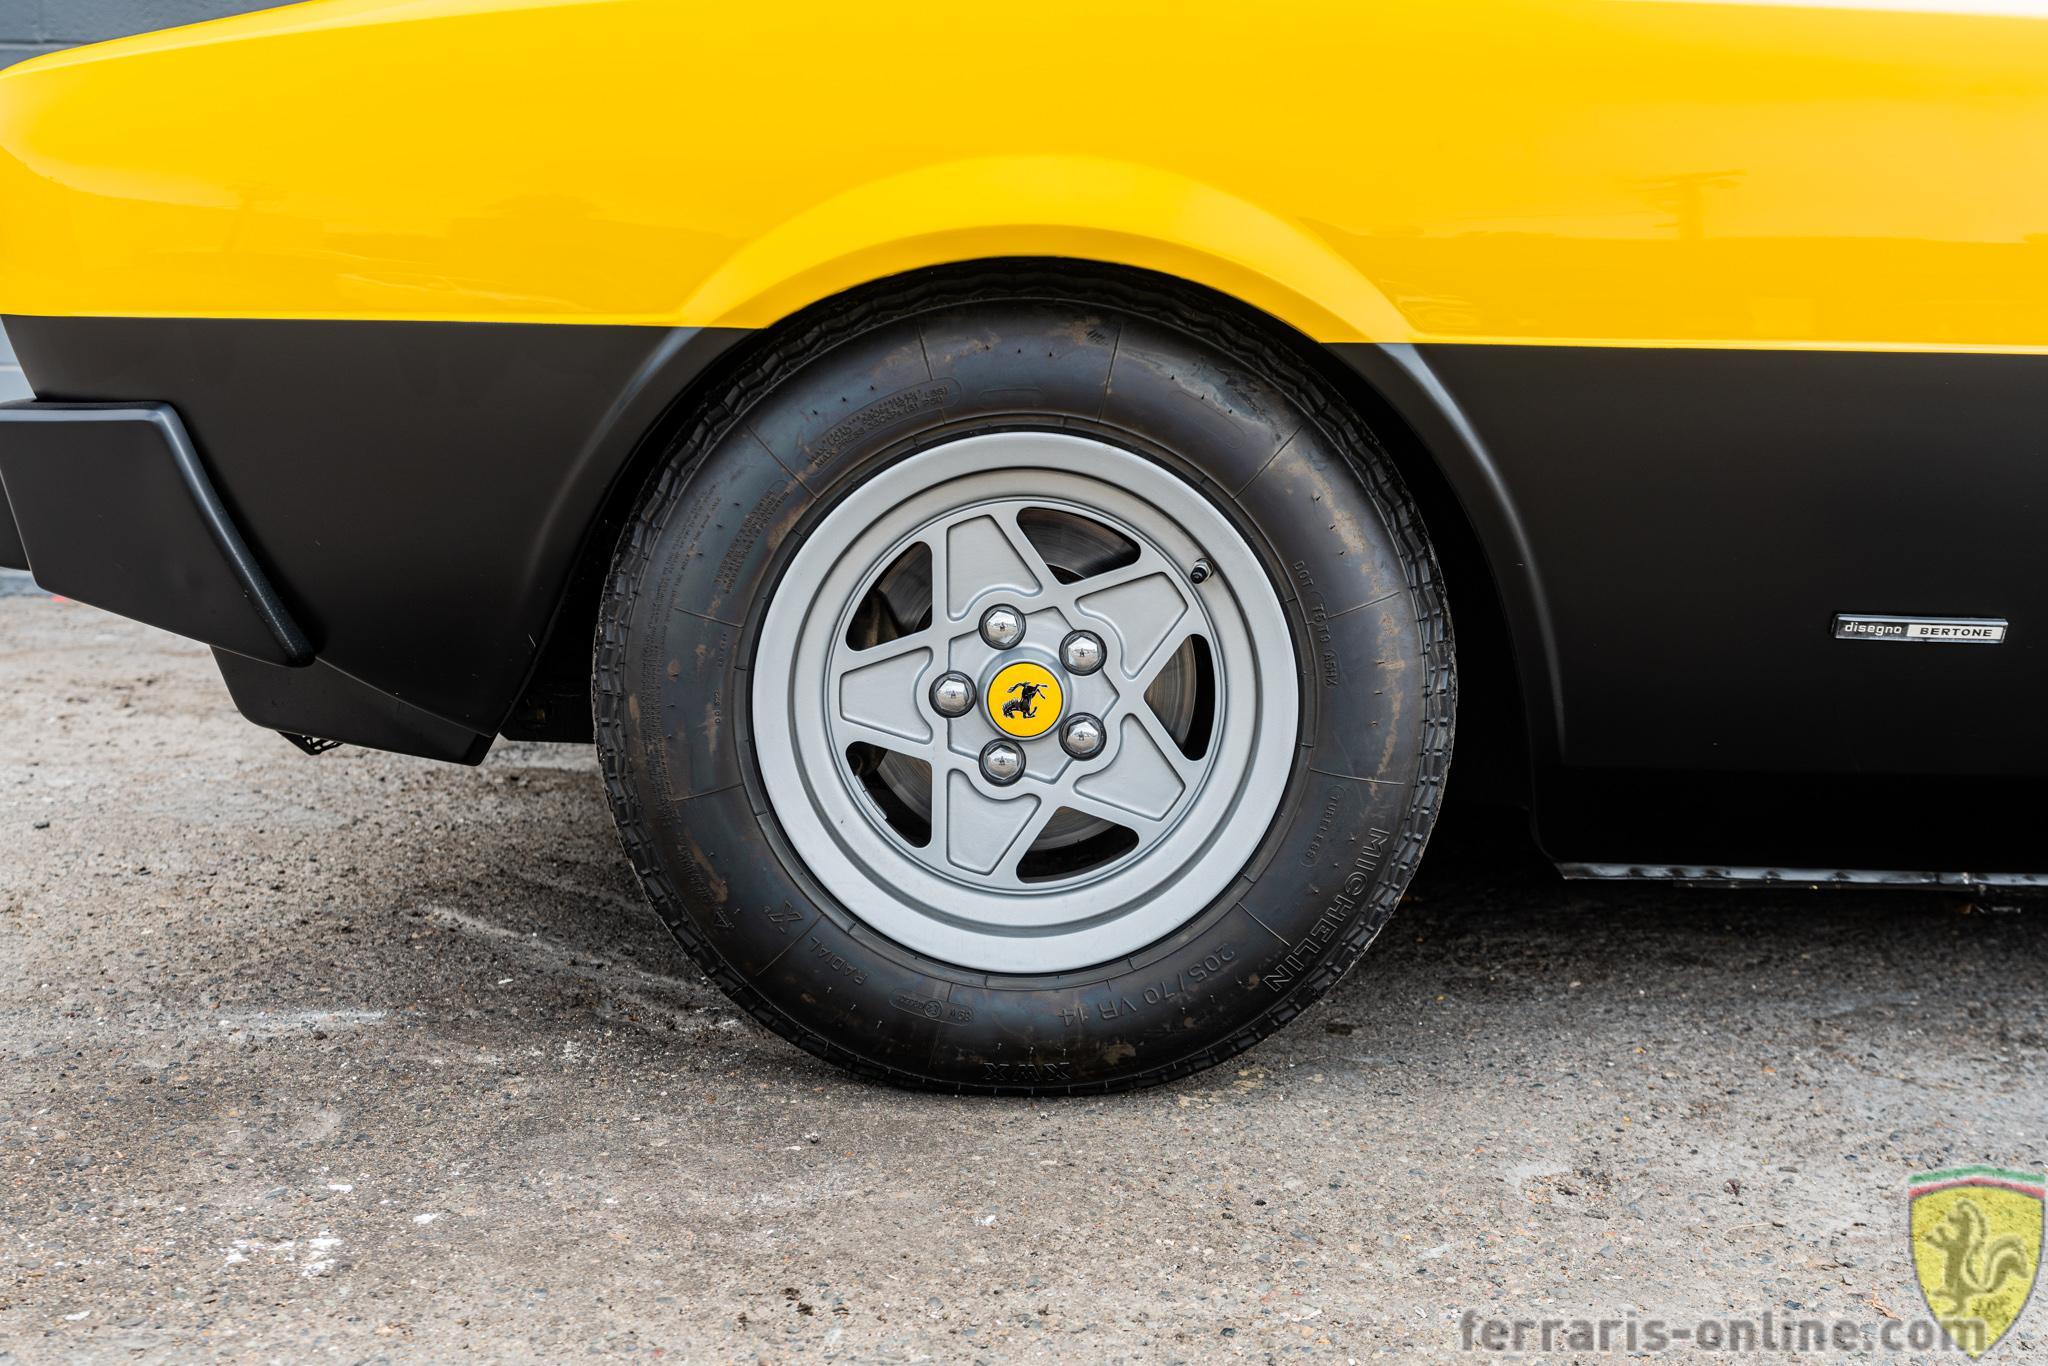 1975 Ferrari 308 GT4 Dino #09978GT